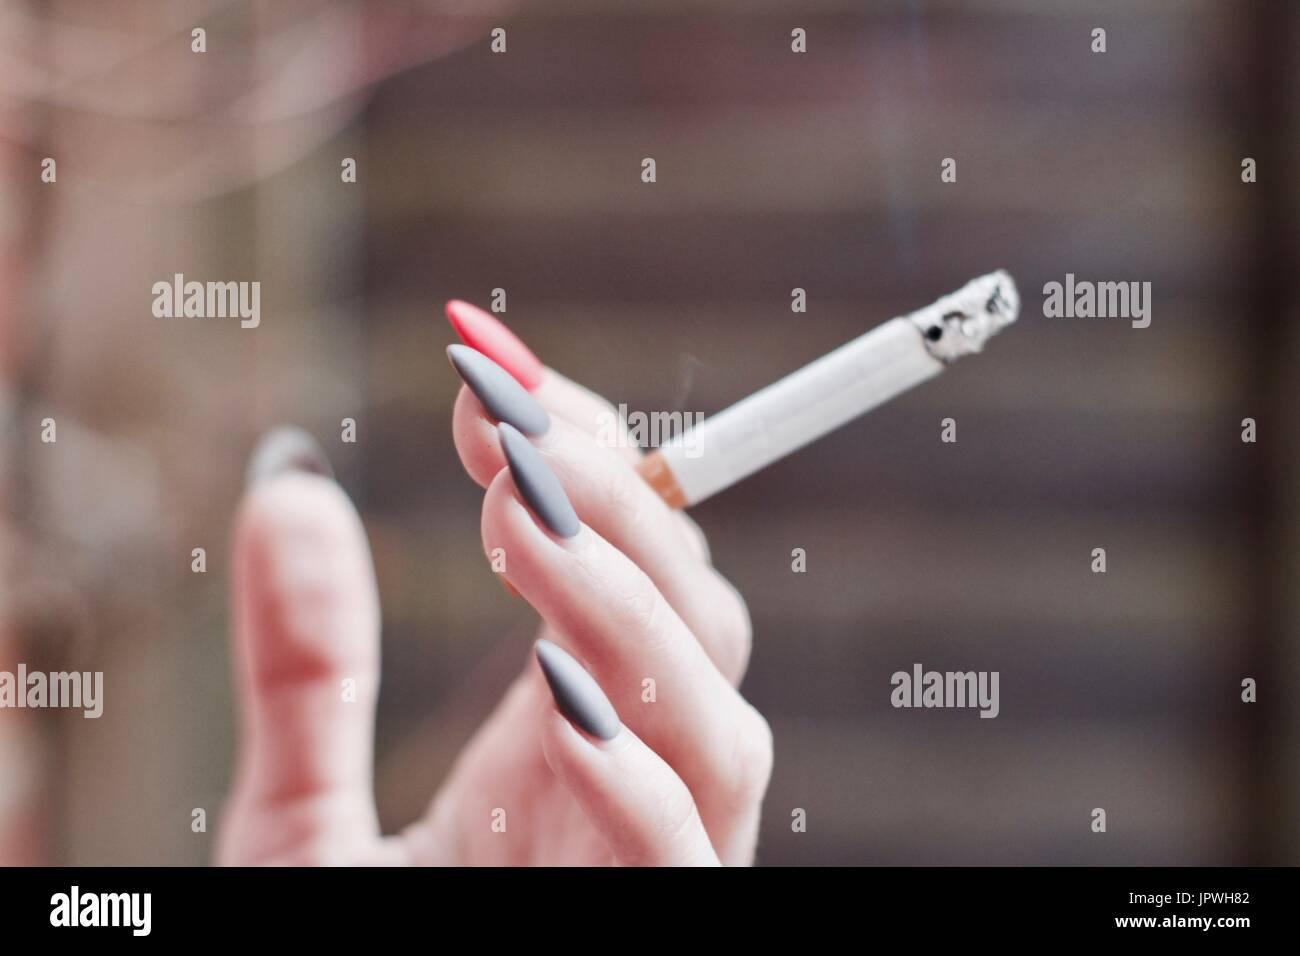 Pink Nails Stockfotos & Pink Nails Bilder - Alamy